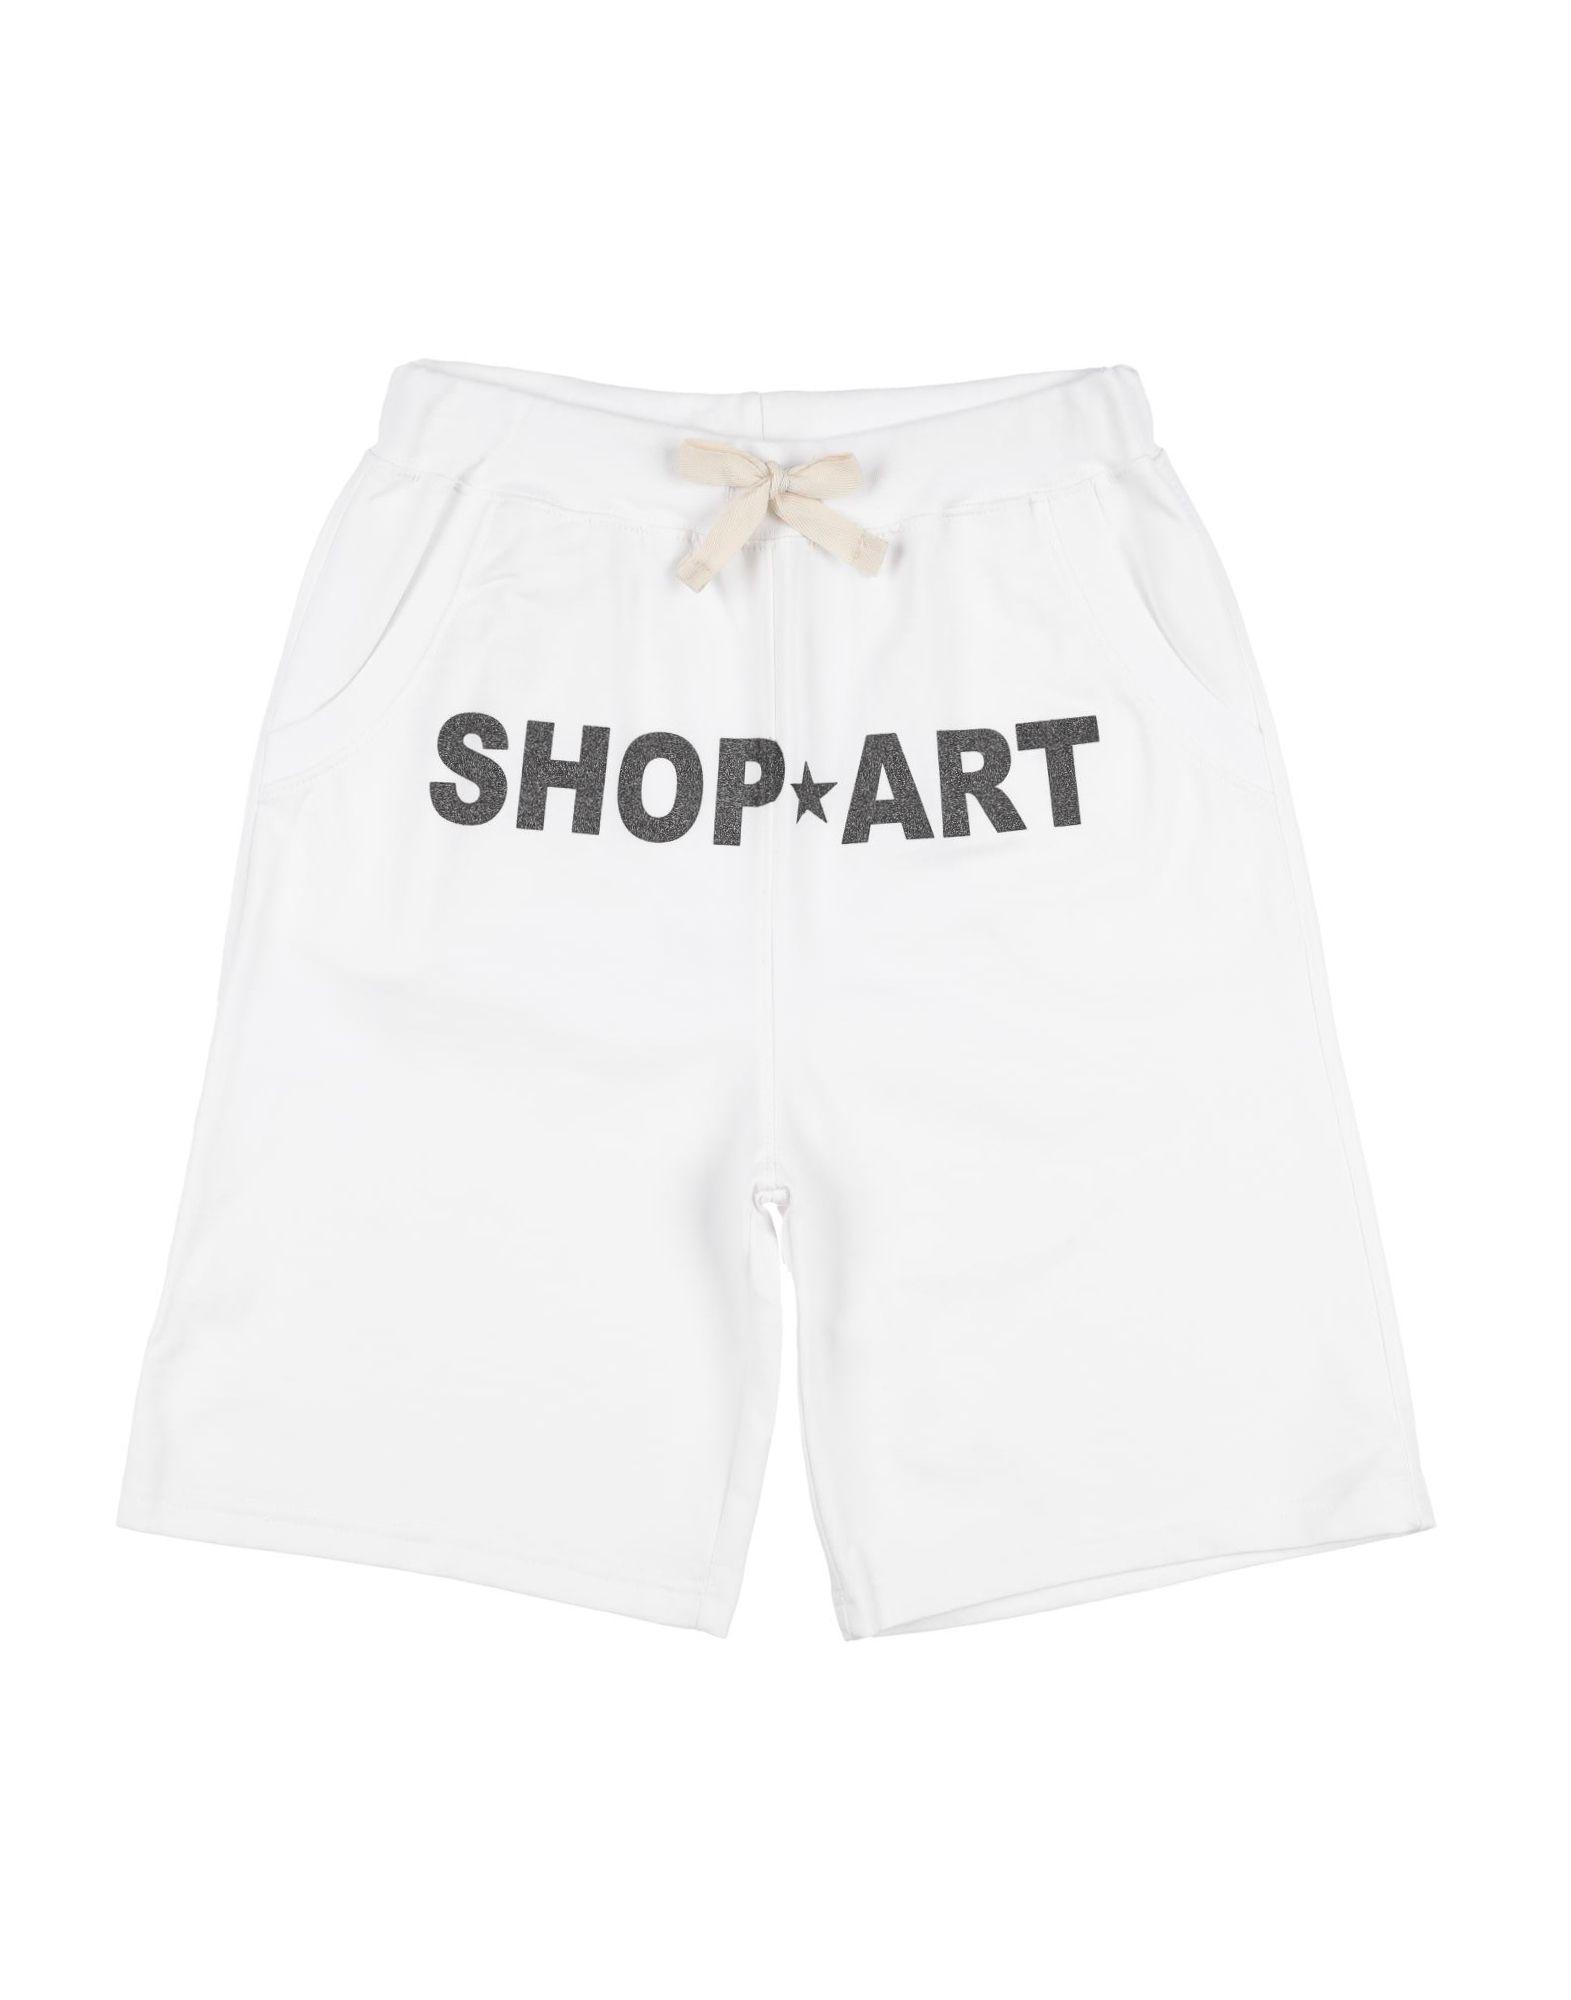 Shop ★ Art Kids' Shop ★ Art Bermudas In White